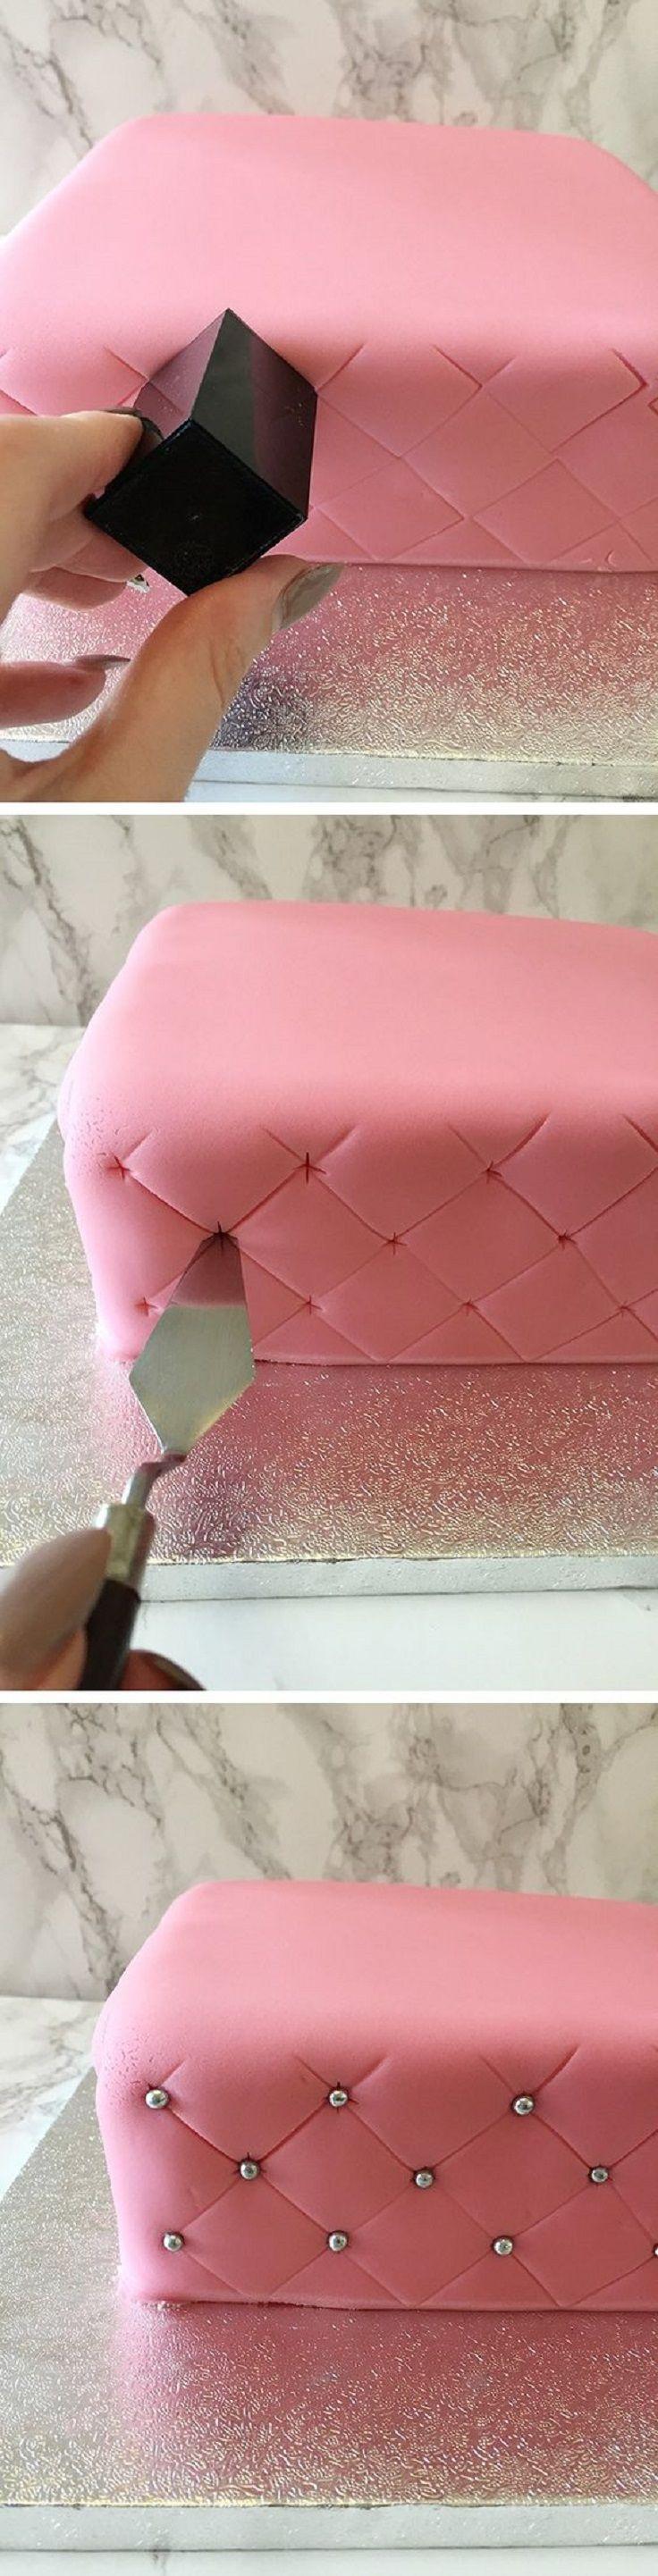 24 best Cake recipes images on Pinterest